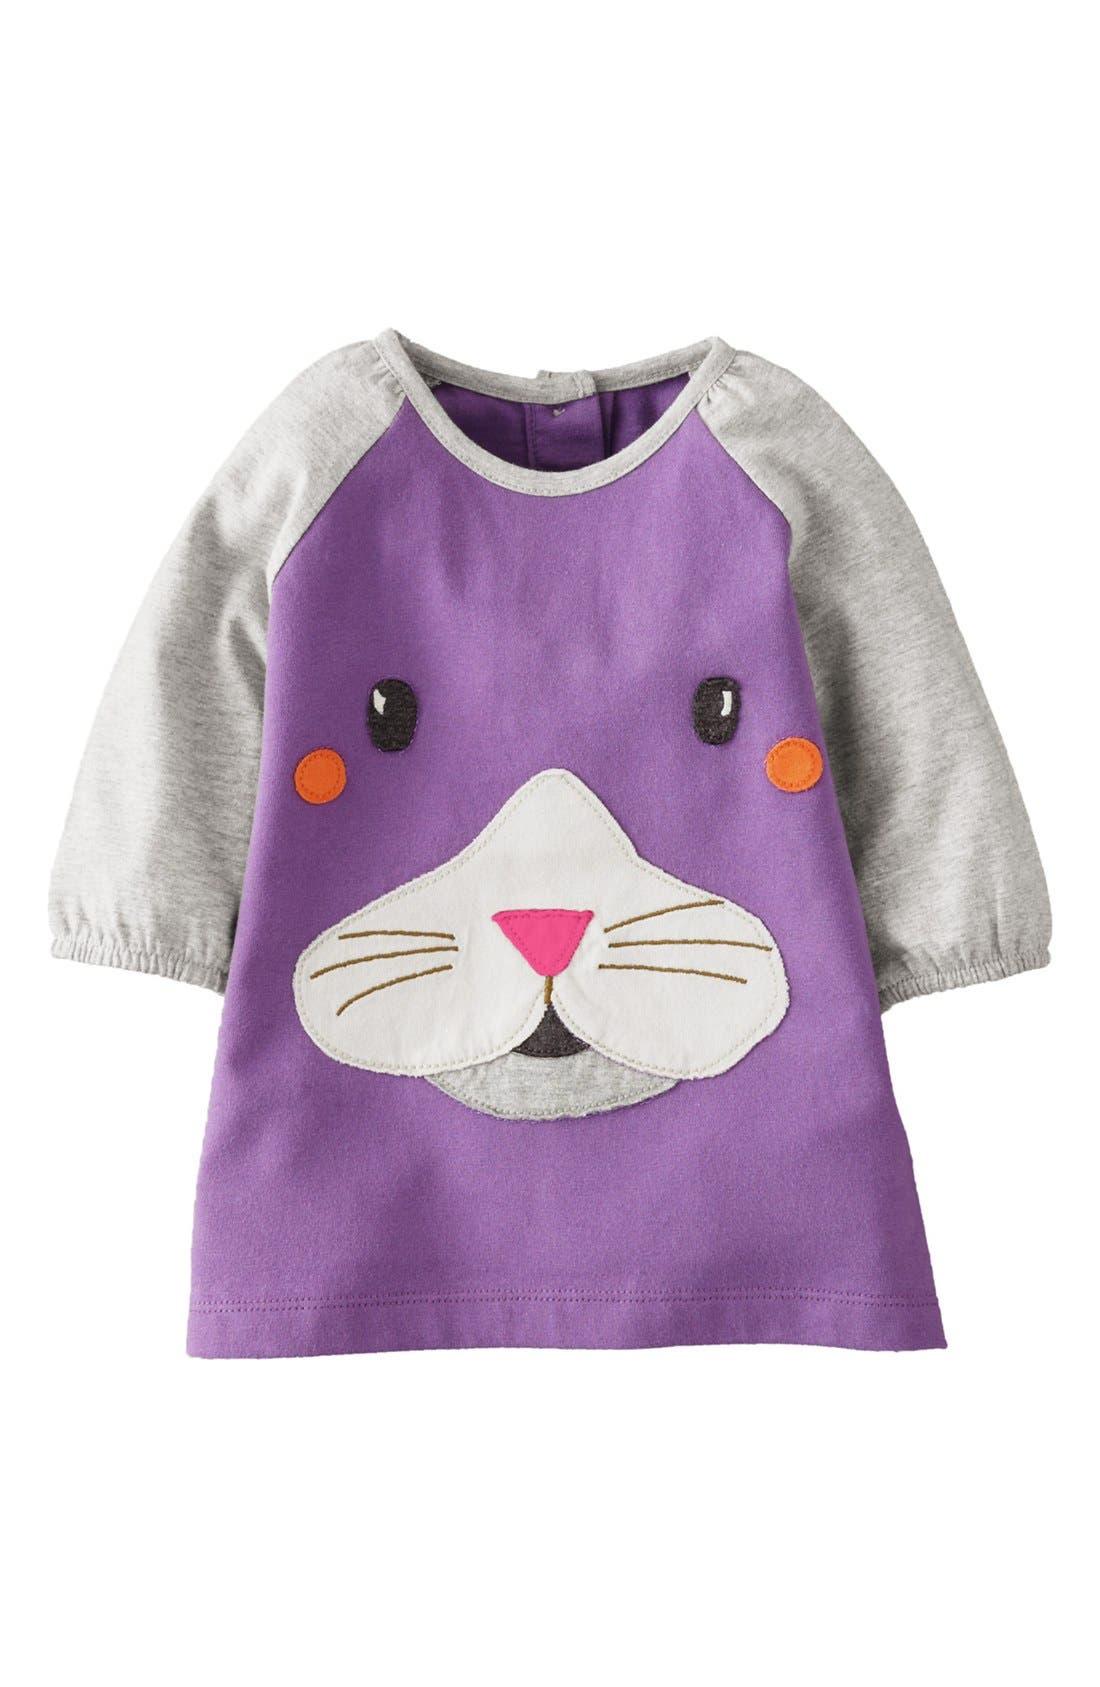 Alternate Image 1 Selected - Mini Boden Appliqué Play Dress (Baby Girls)